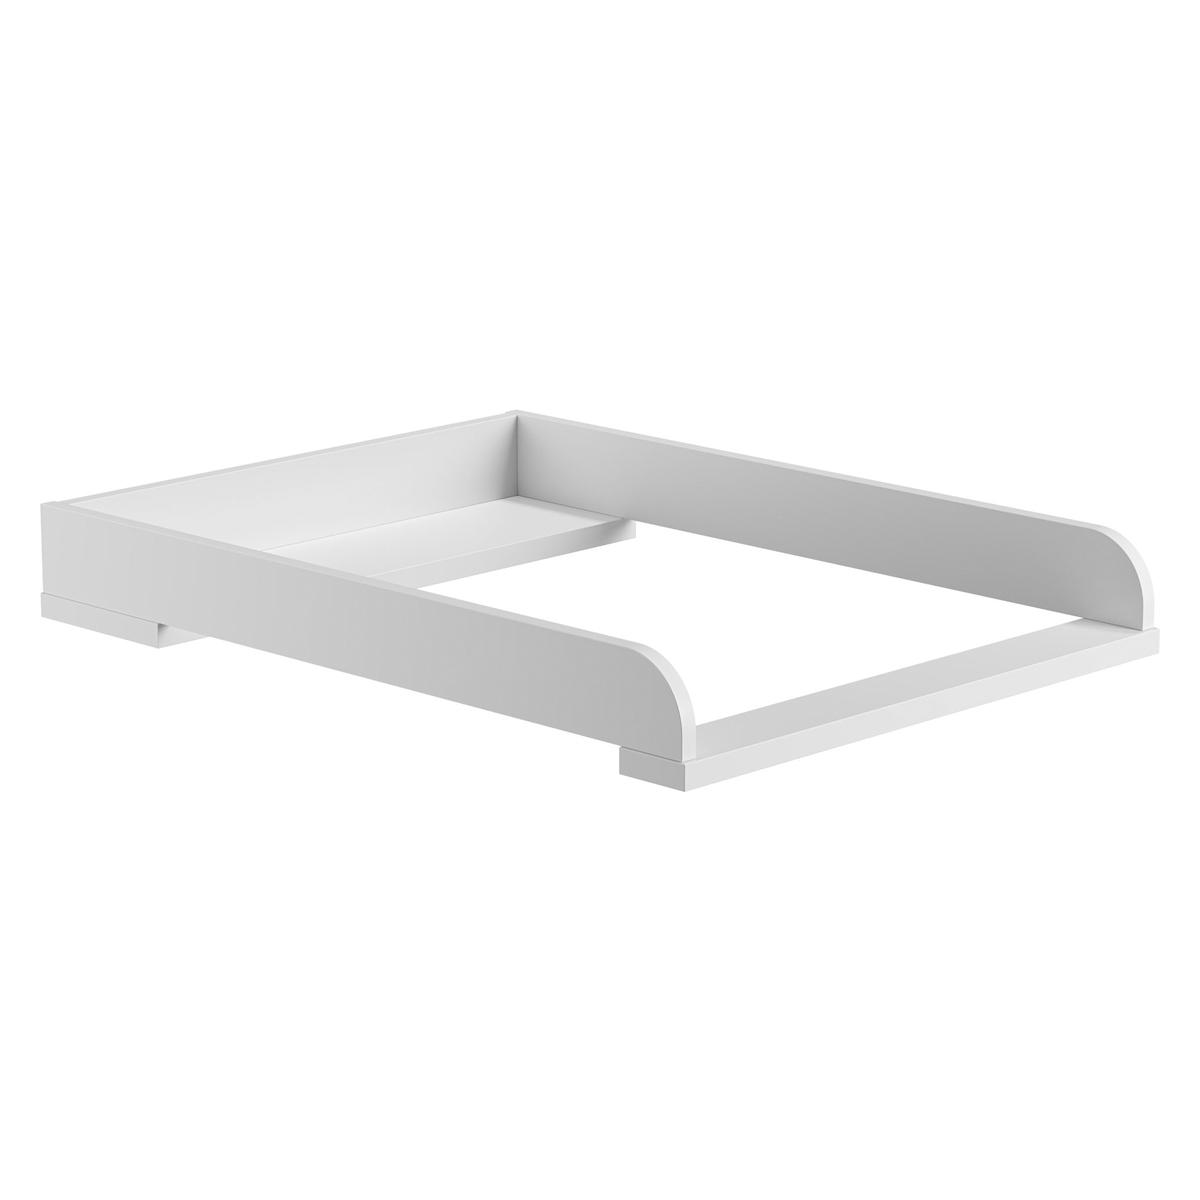 Table à langer Plan à Langer Lounge - Blanc Plan à Langer Lounge - Blanc